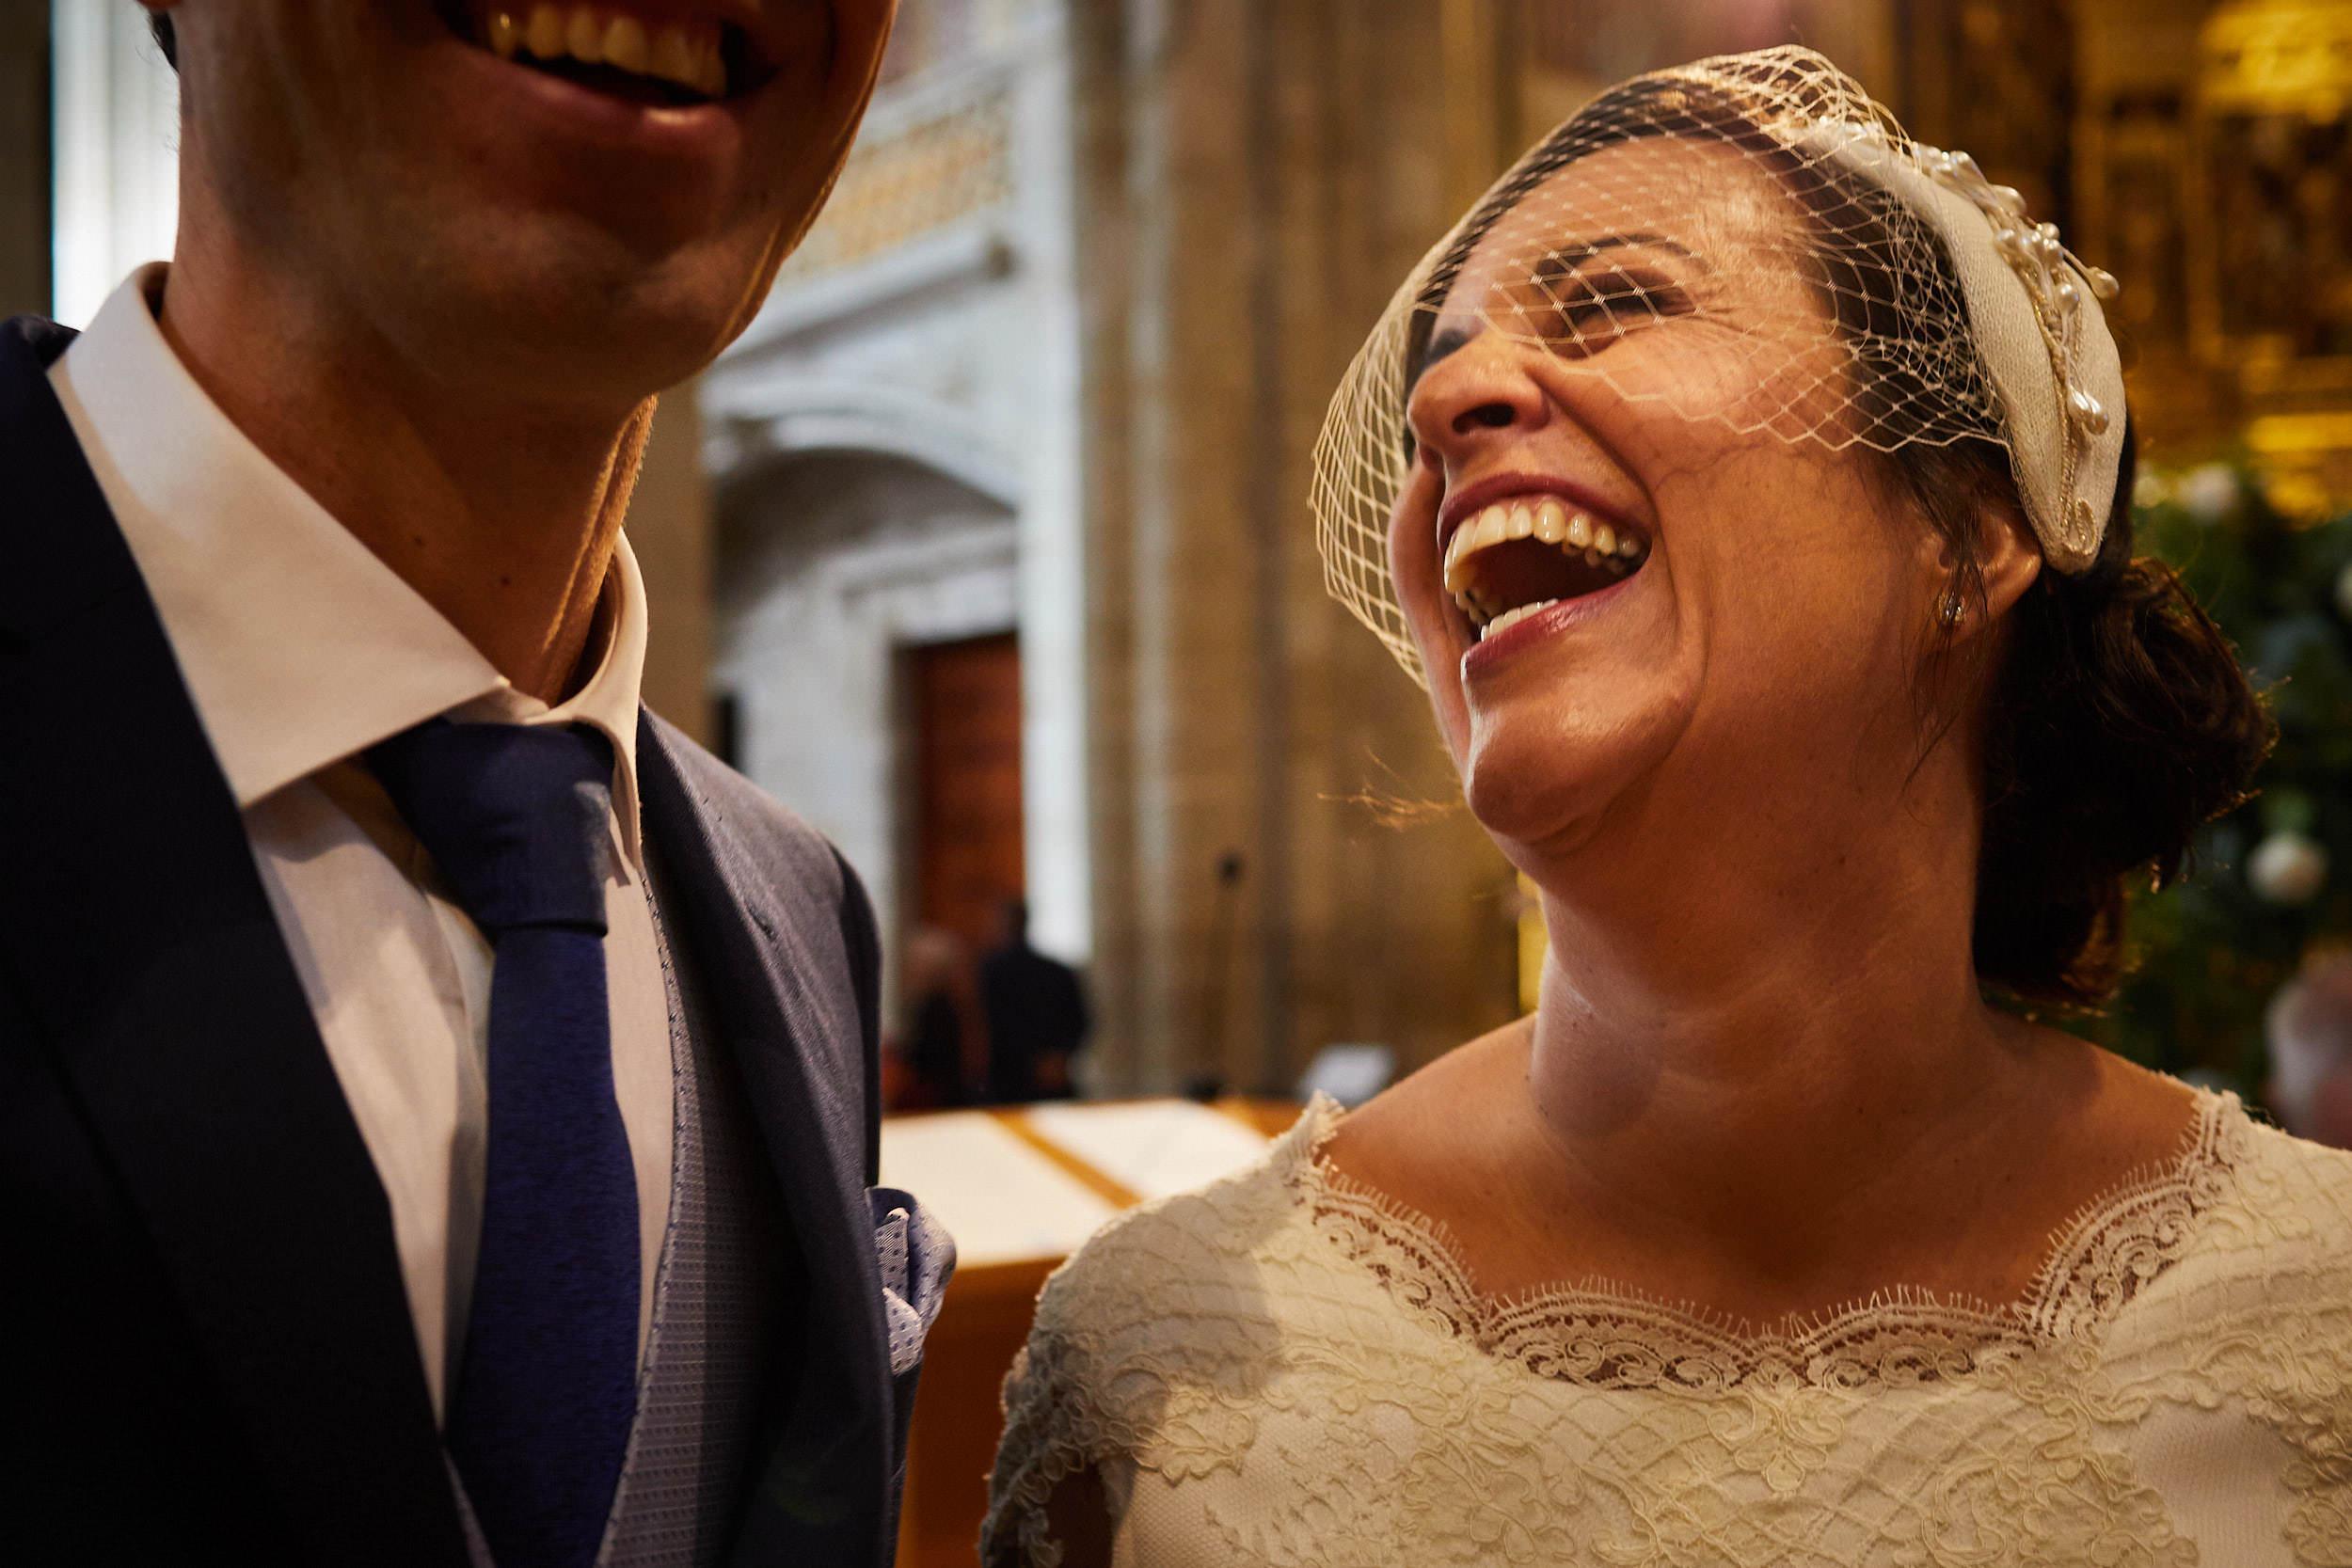 1811Basque_Country_Rioja_Wedding_Photographer_James_Sturcke_0041.jpg